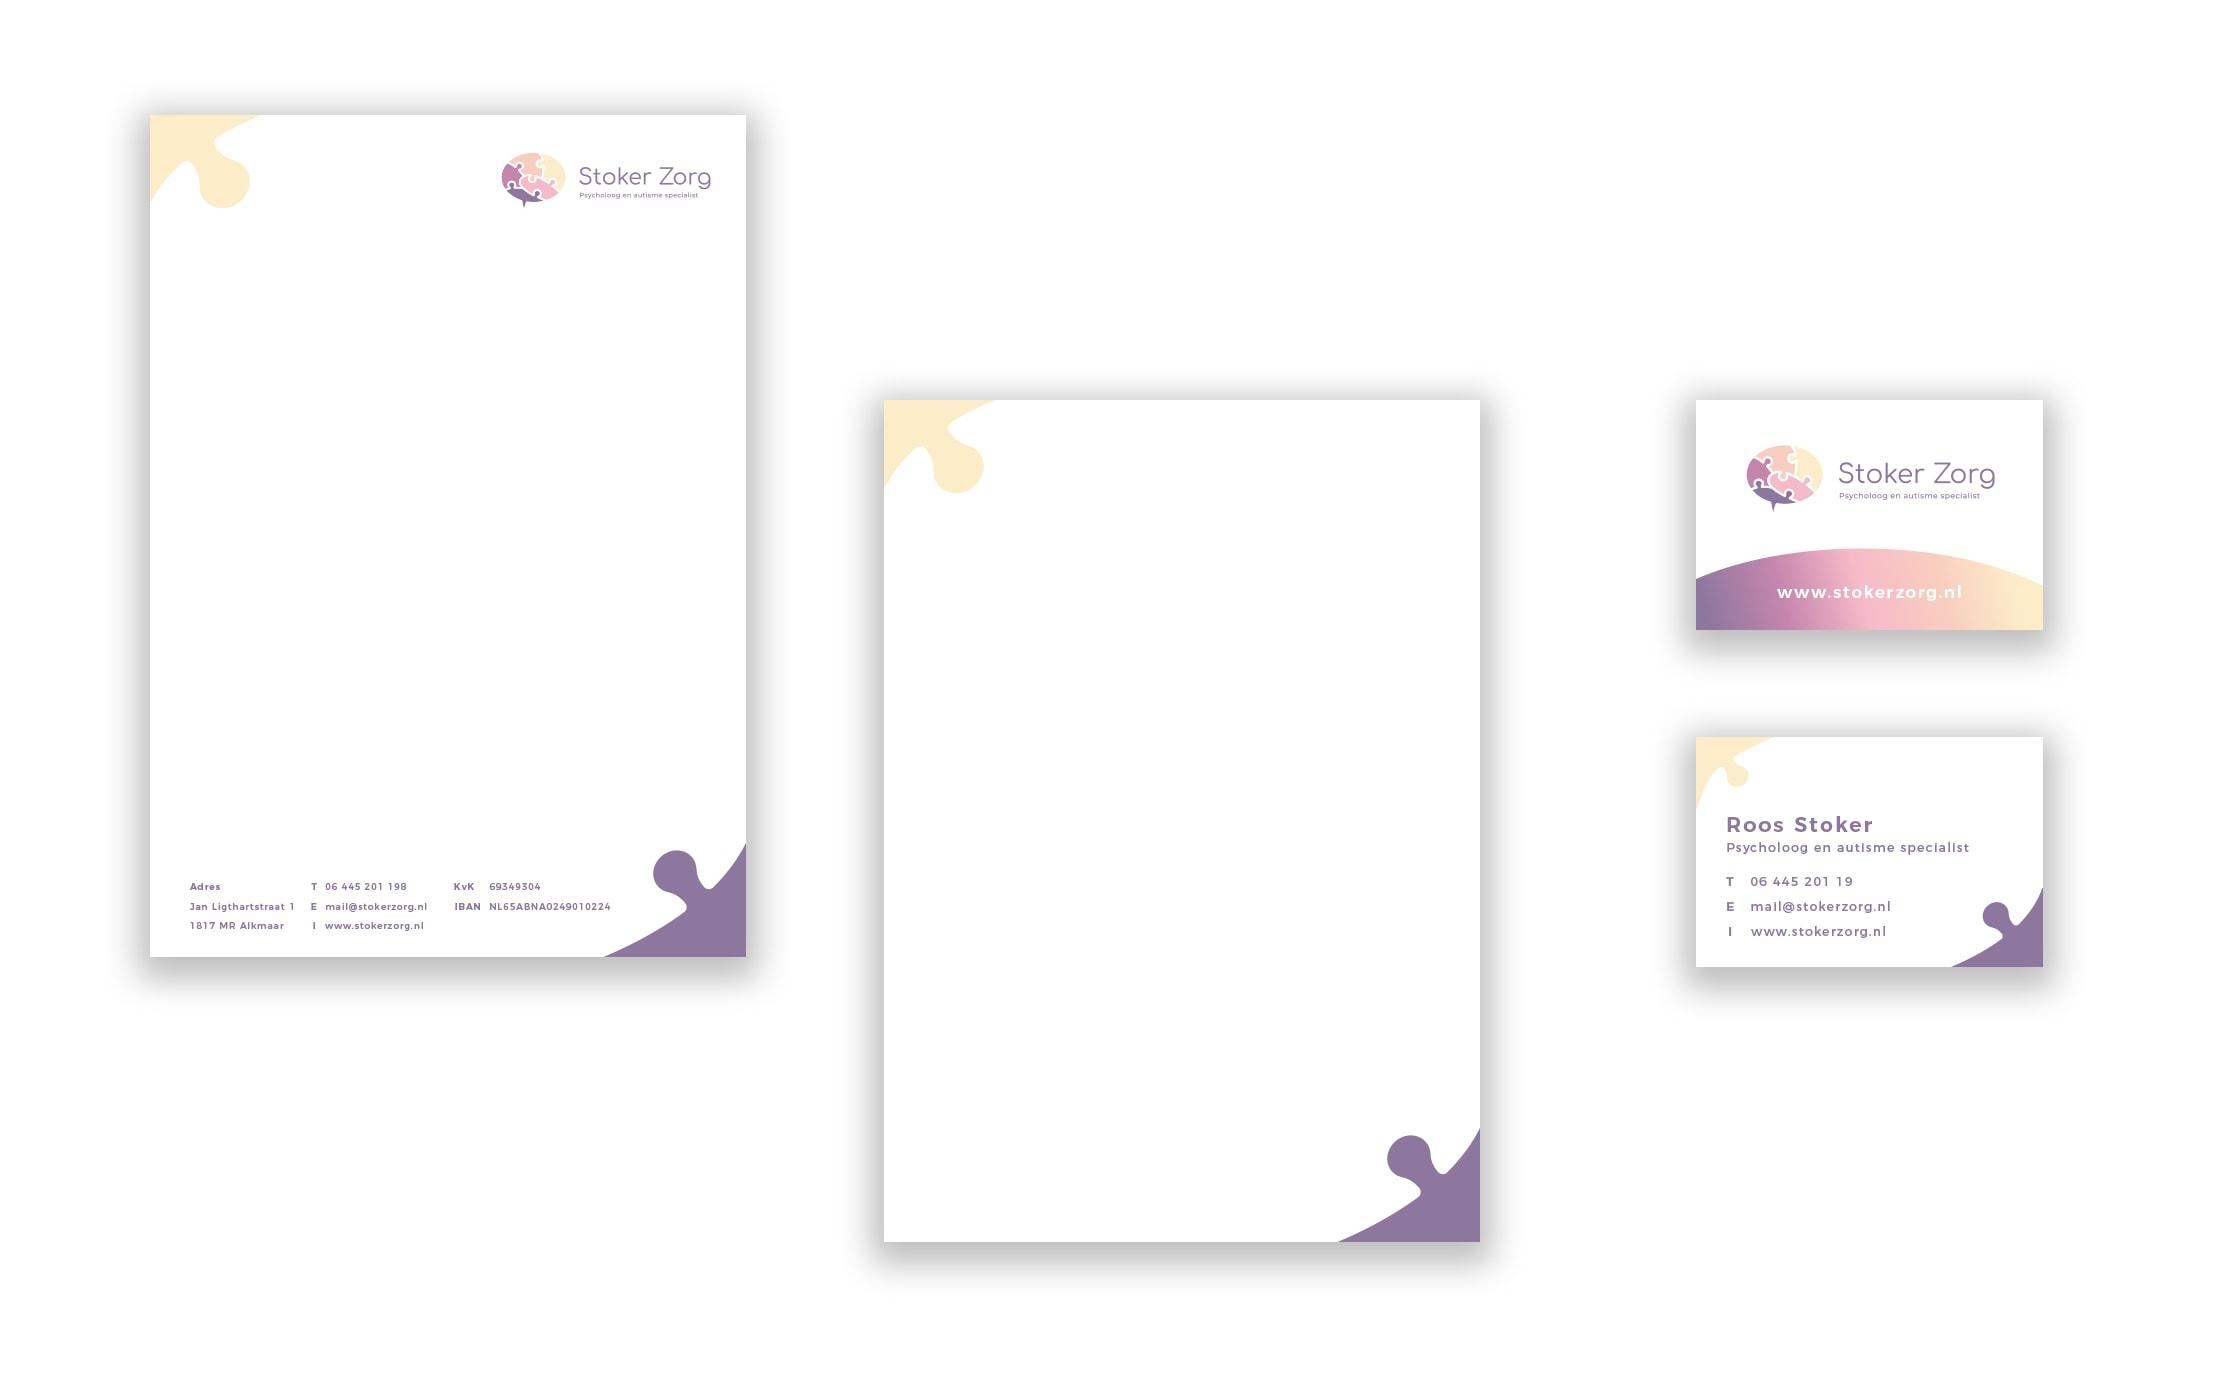 branding_ontwerp_stoker_zorg_dreamlab_portfolio